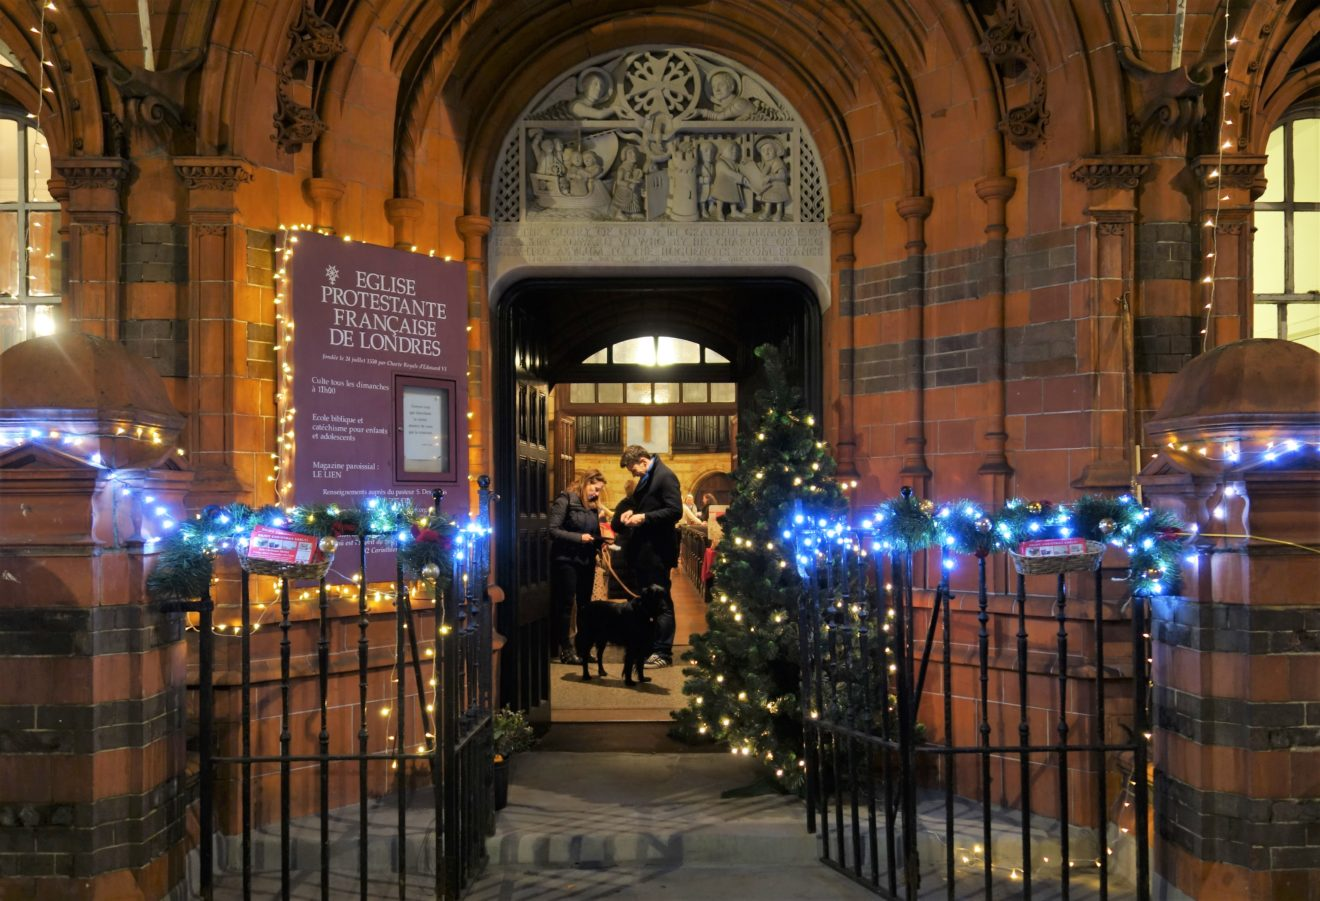 Portes ouvertes Christmas Market Eglise Protestante